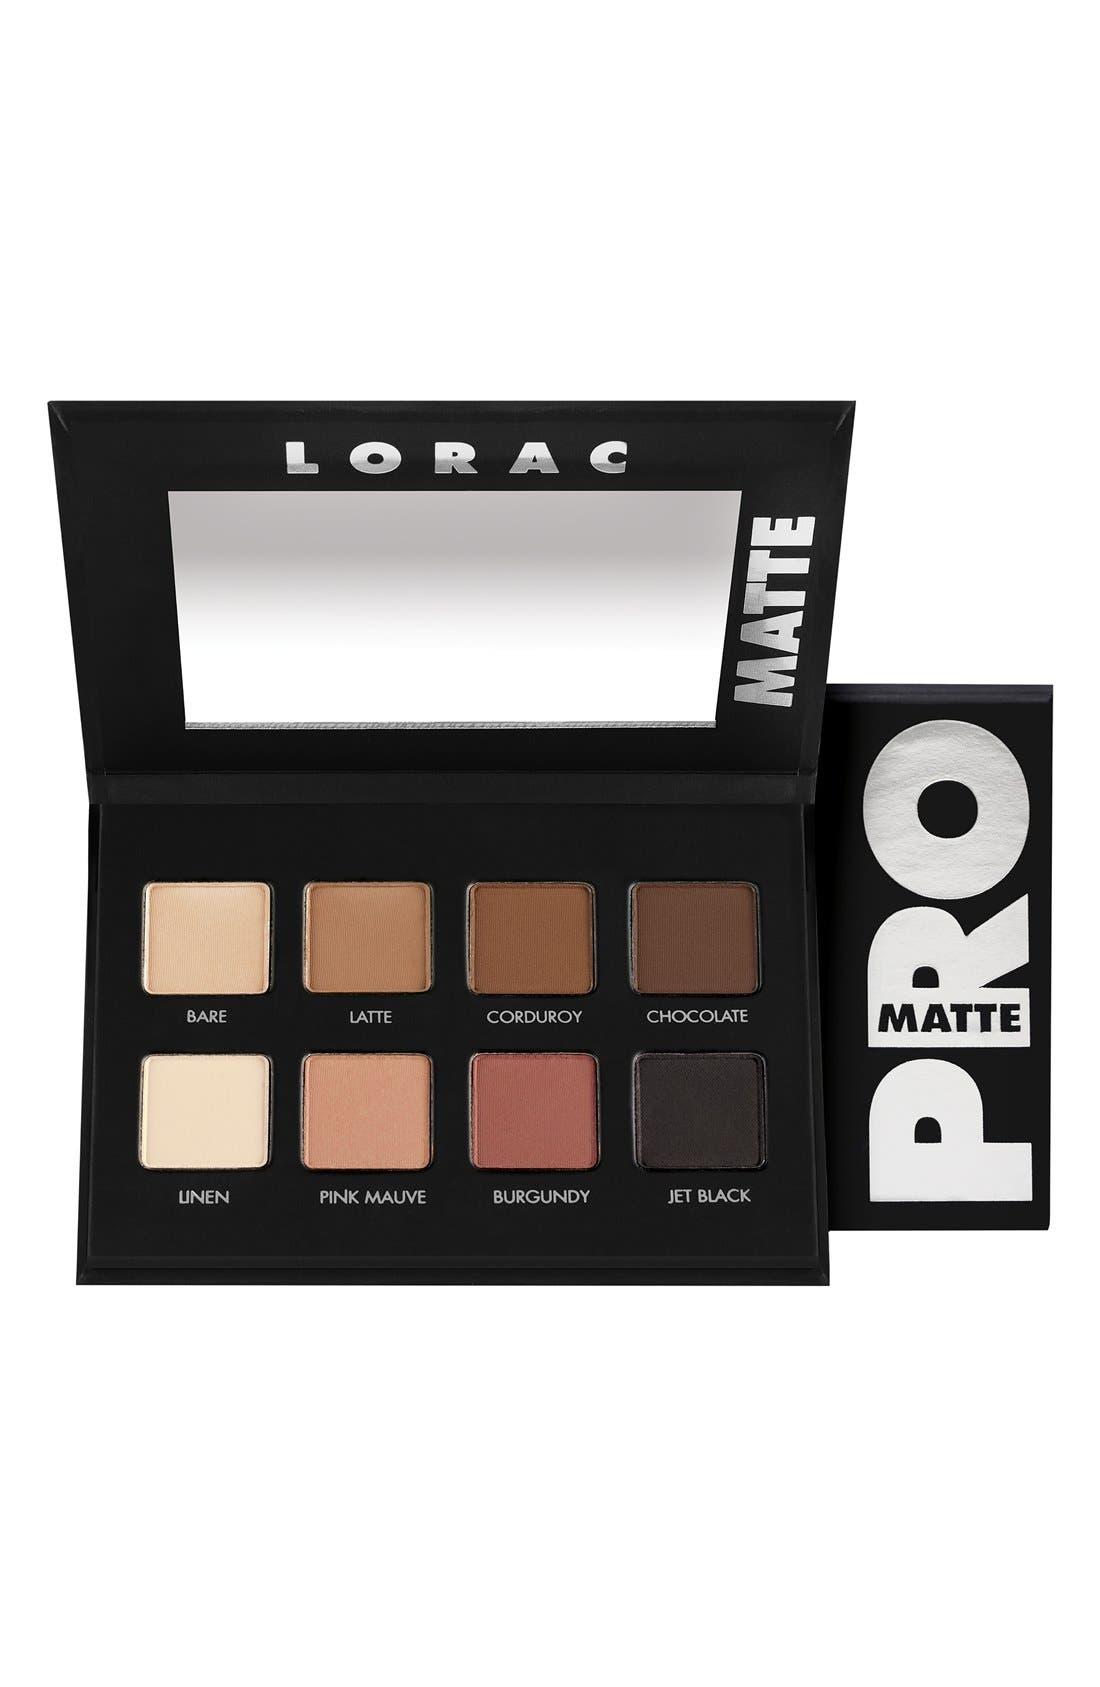 LORAC 'PRO' Matte Eyeshadow Palette, Main, color, 000